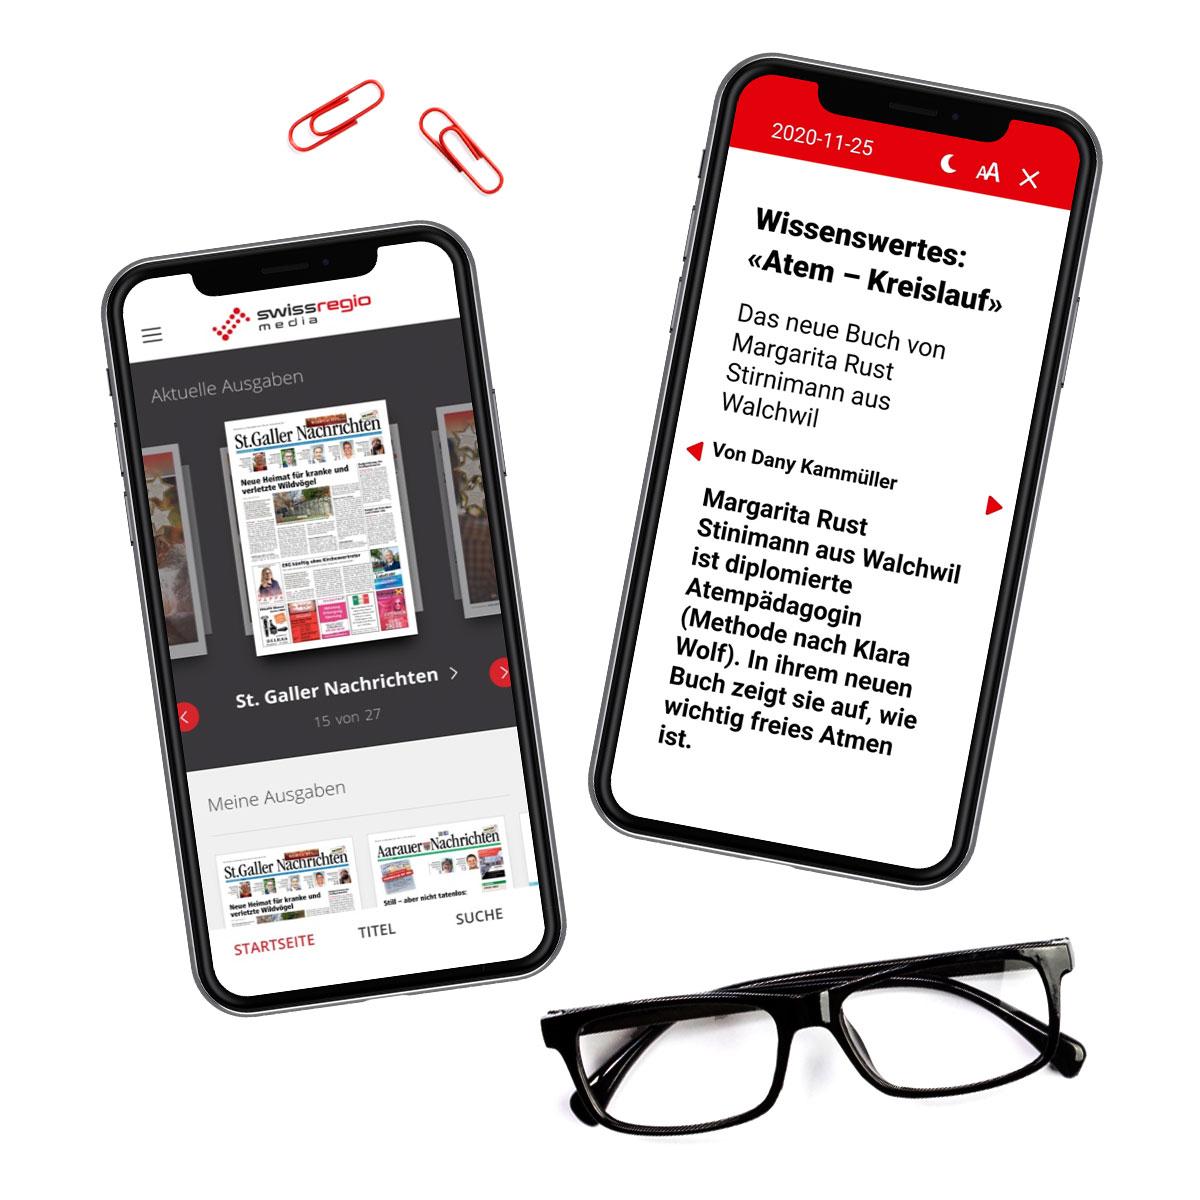 Swiss Regiomedia Case Study Header Image